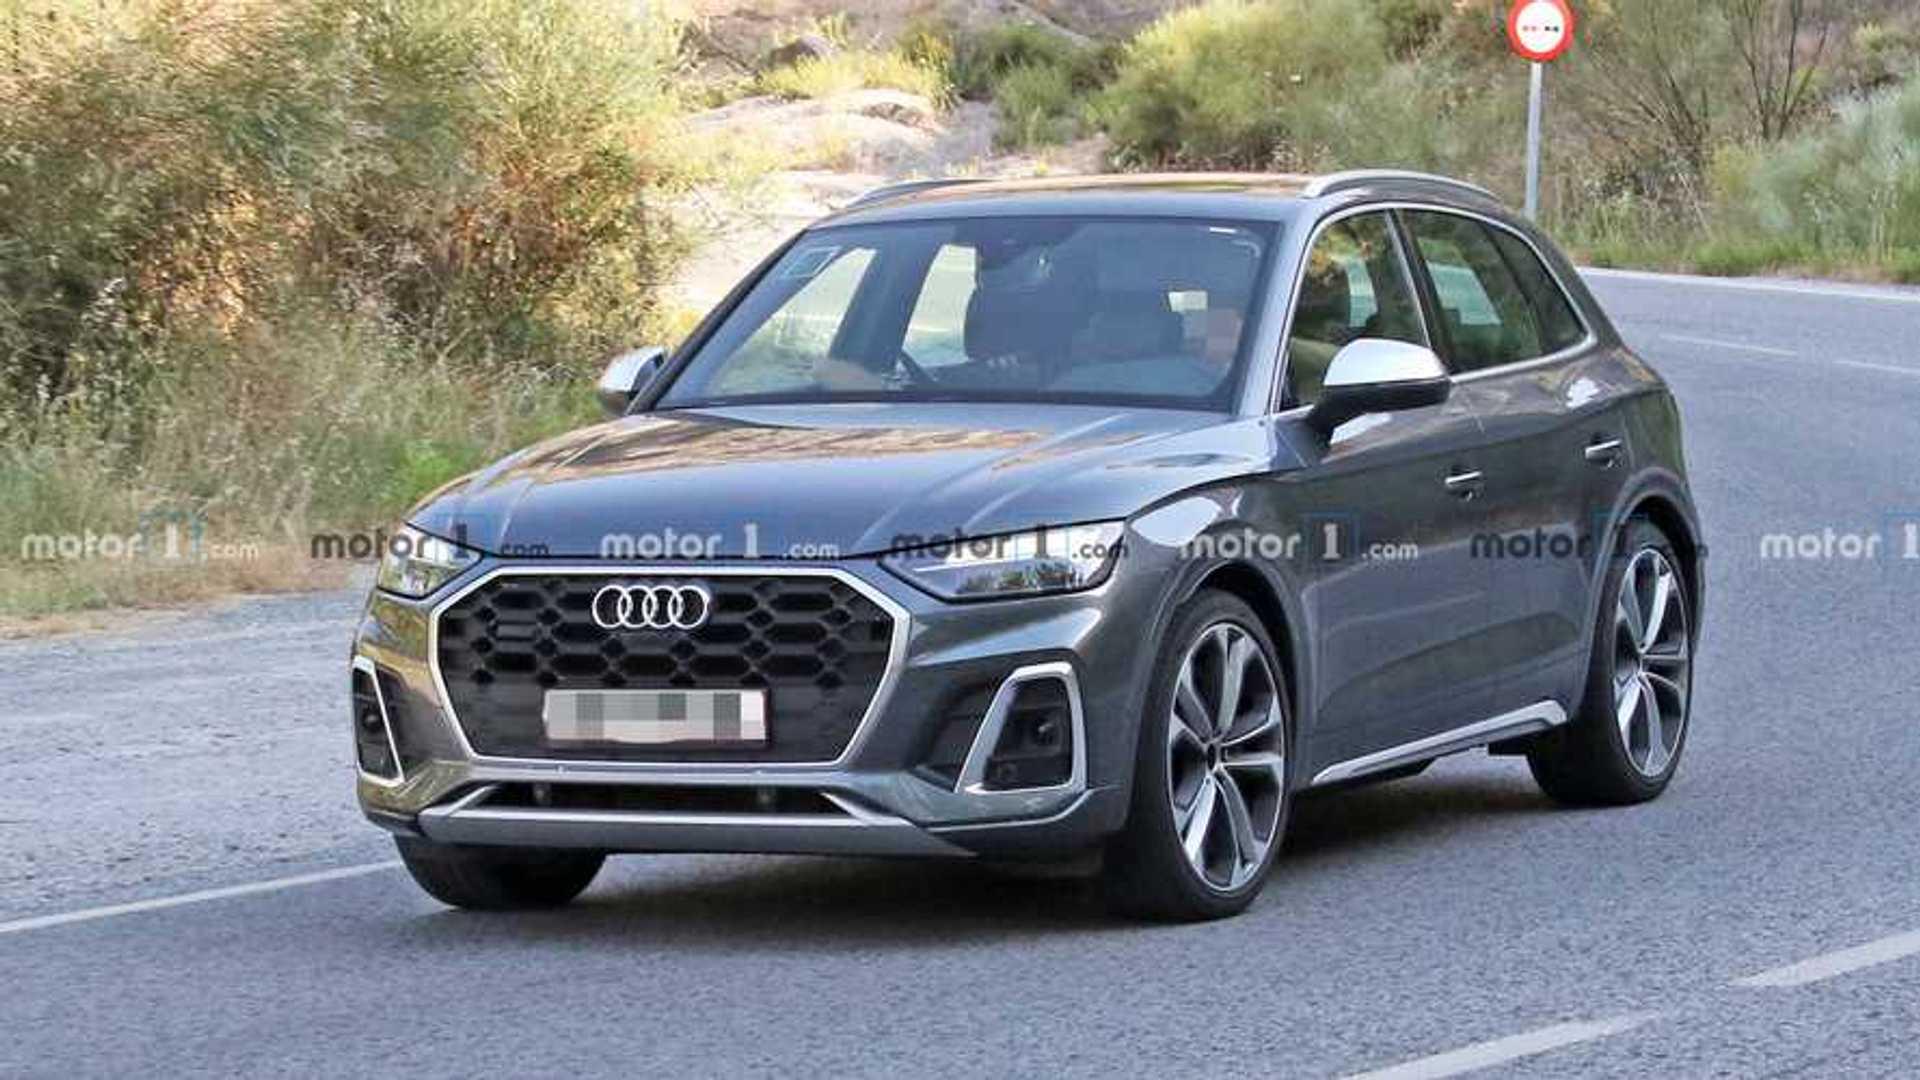 2021 Audi Sq5 History